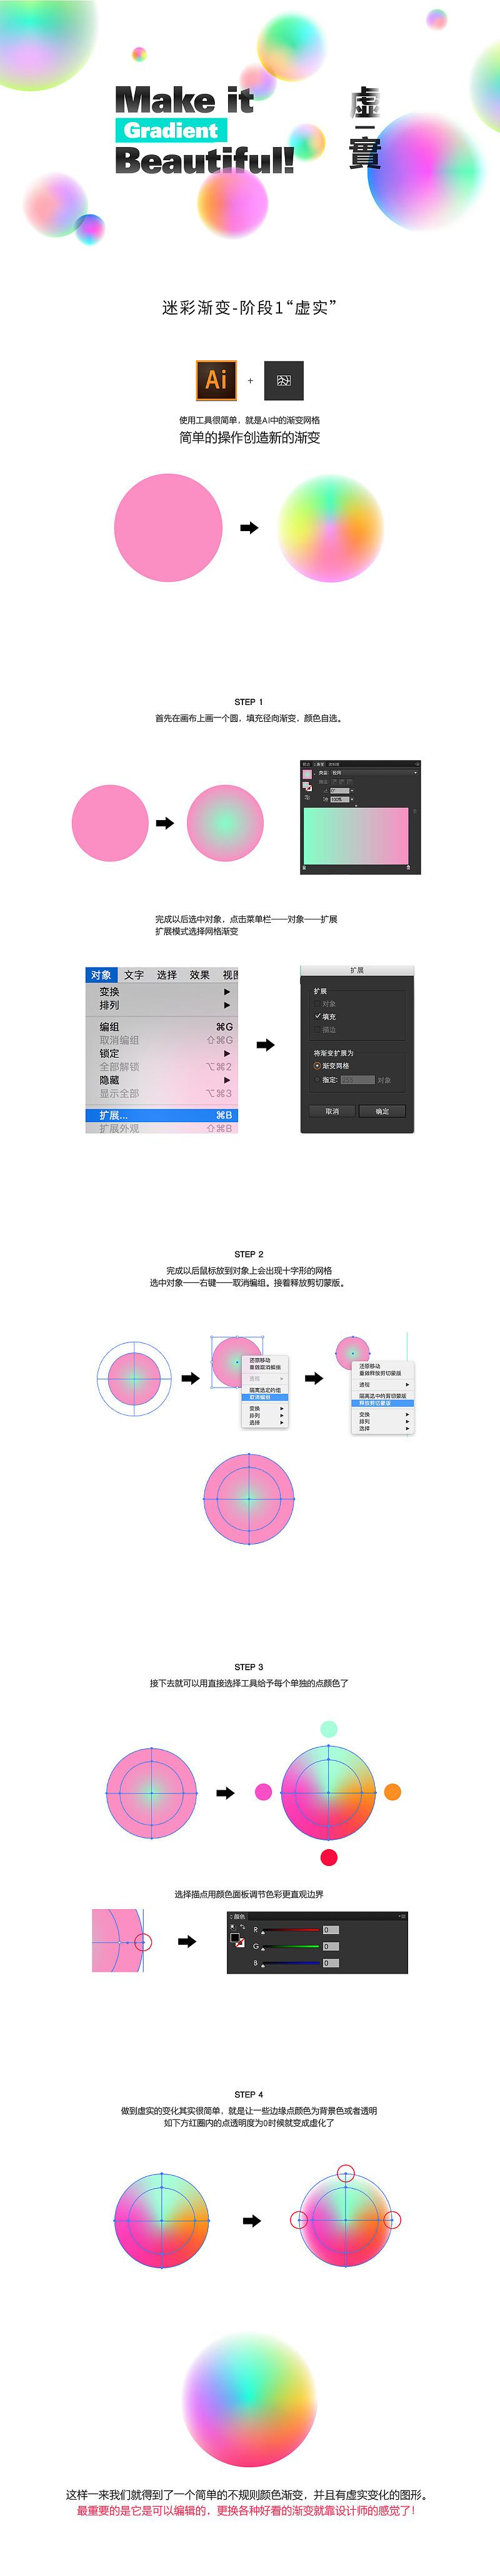 photoshop教程:如何iphoneX壁纸制作